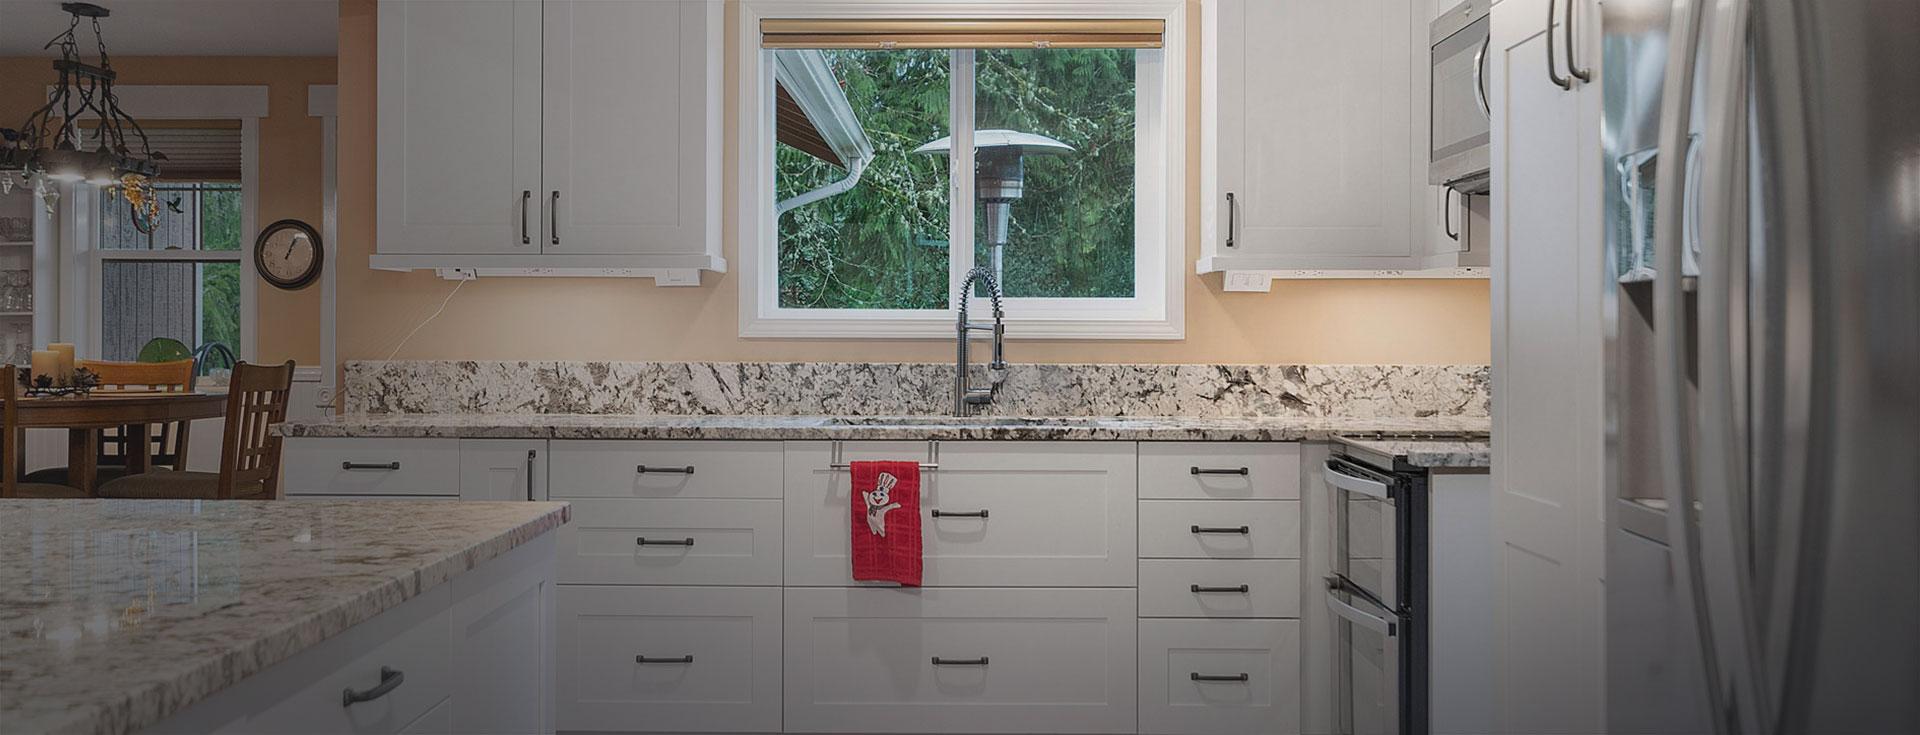 Project-Hero-McBride-ContactUs - Cabinets by Trivonna